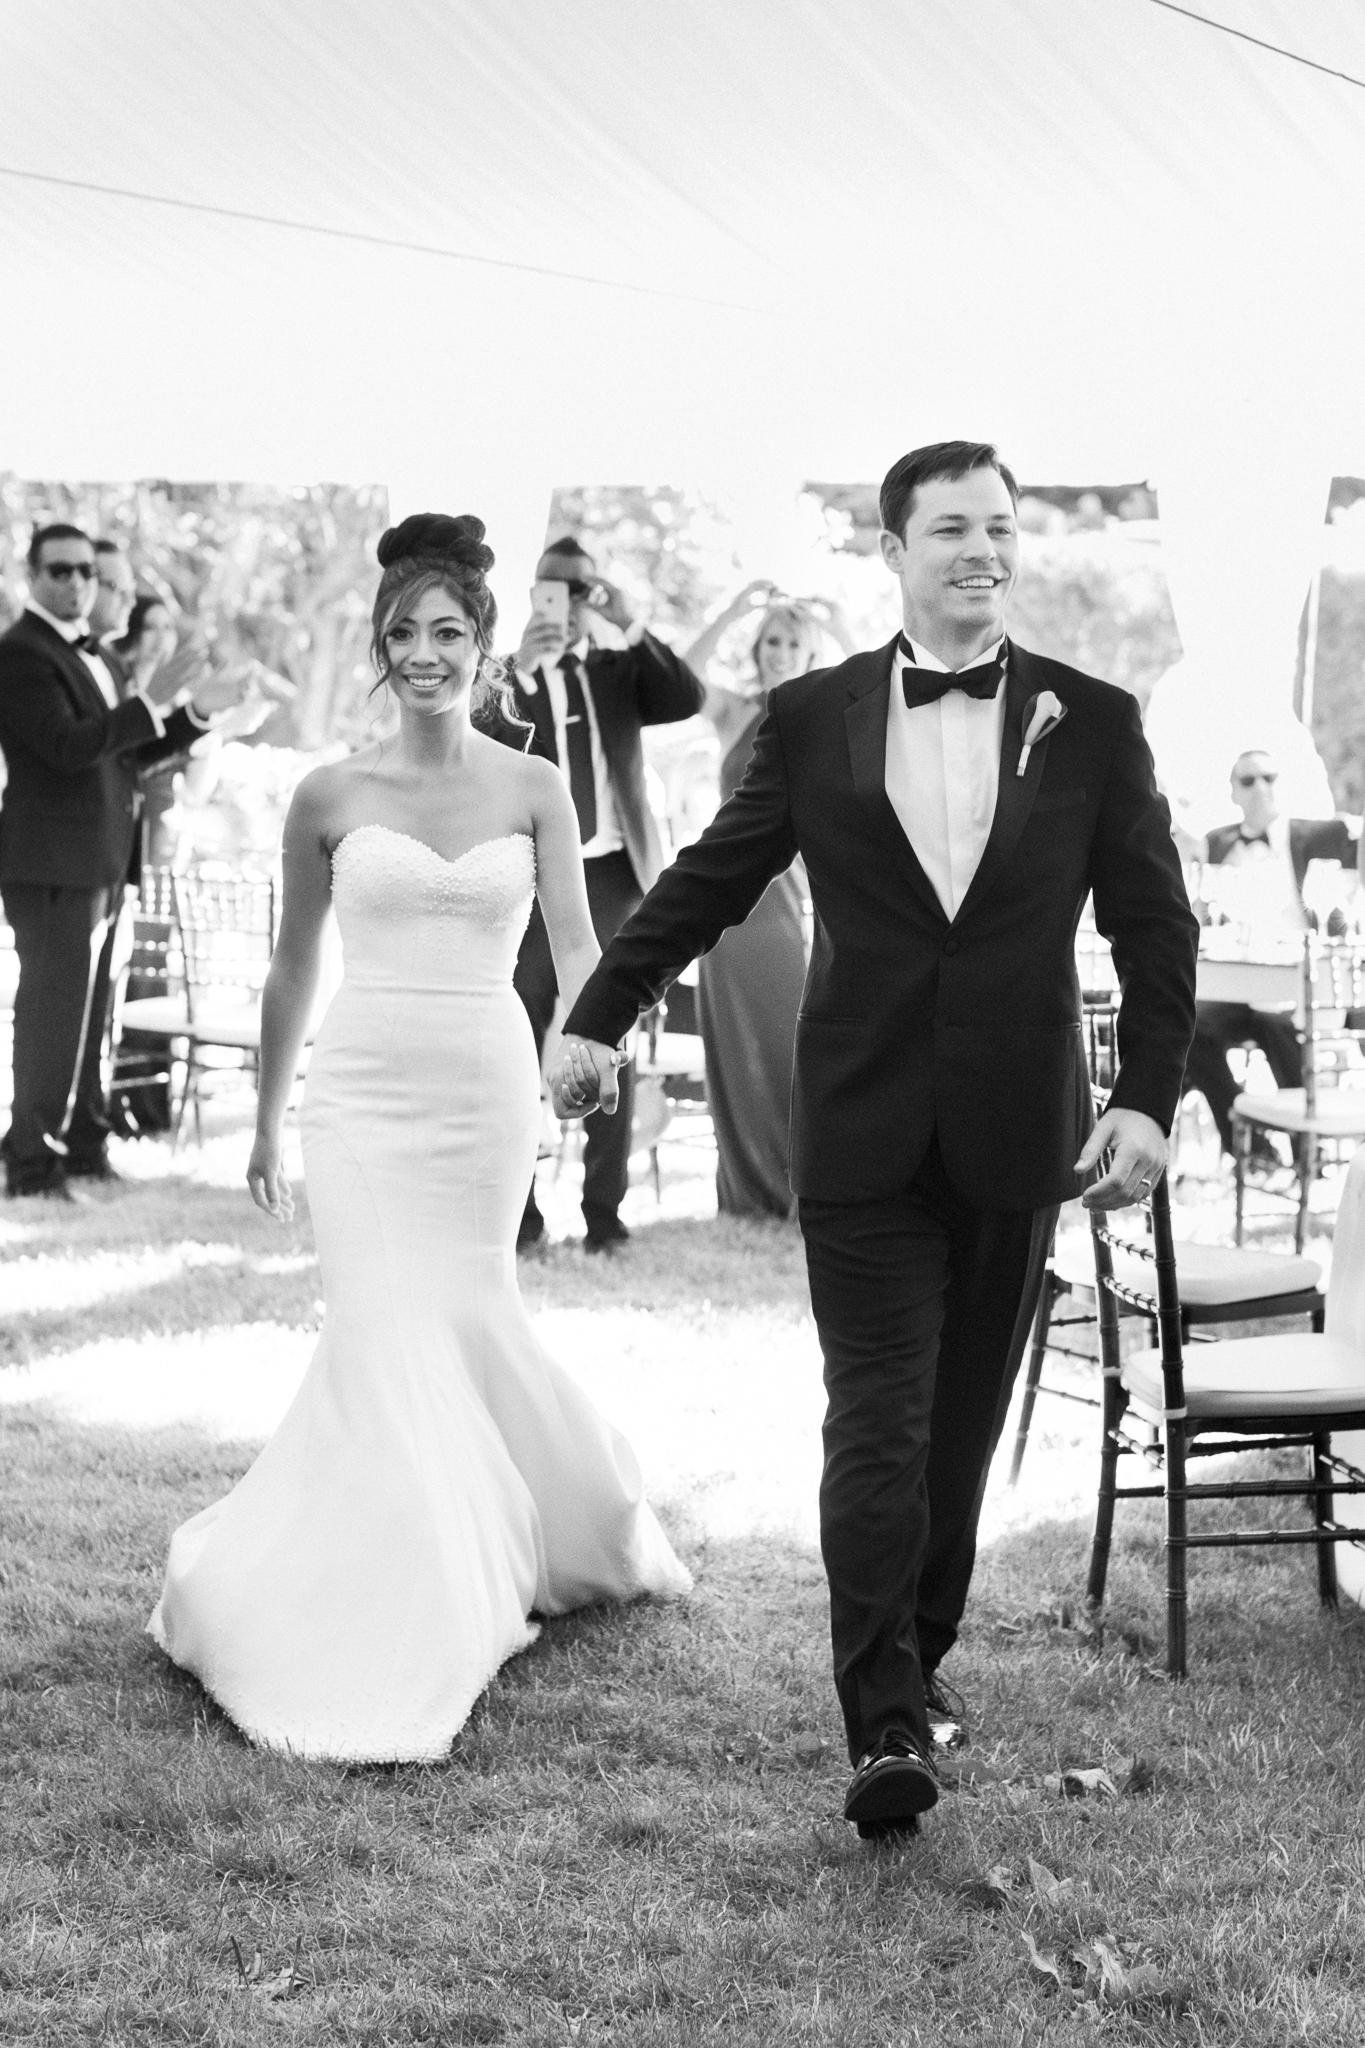 162OutliveCreative_Travel_Photographer_Videographer_Lewis&Clark_Oregon_Elegant_BlackTie_Destination_Wedding.jpg